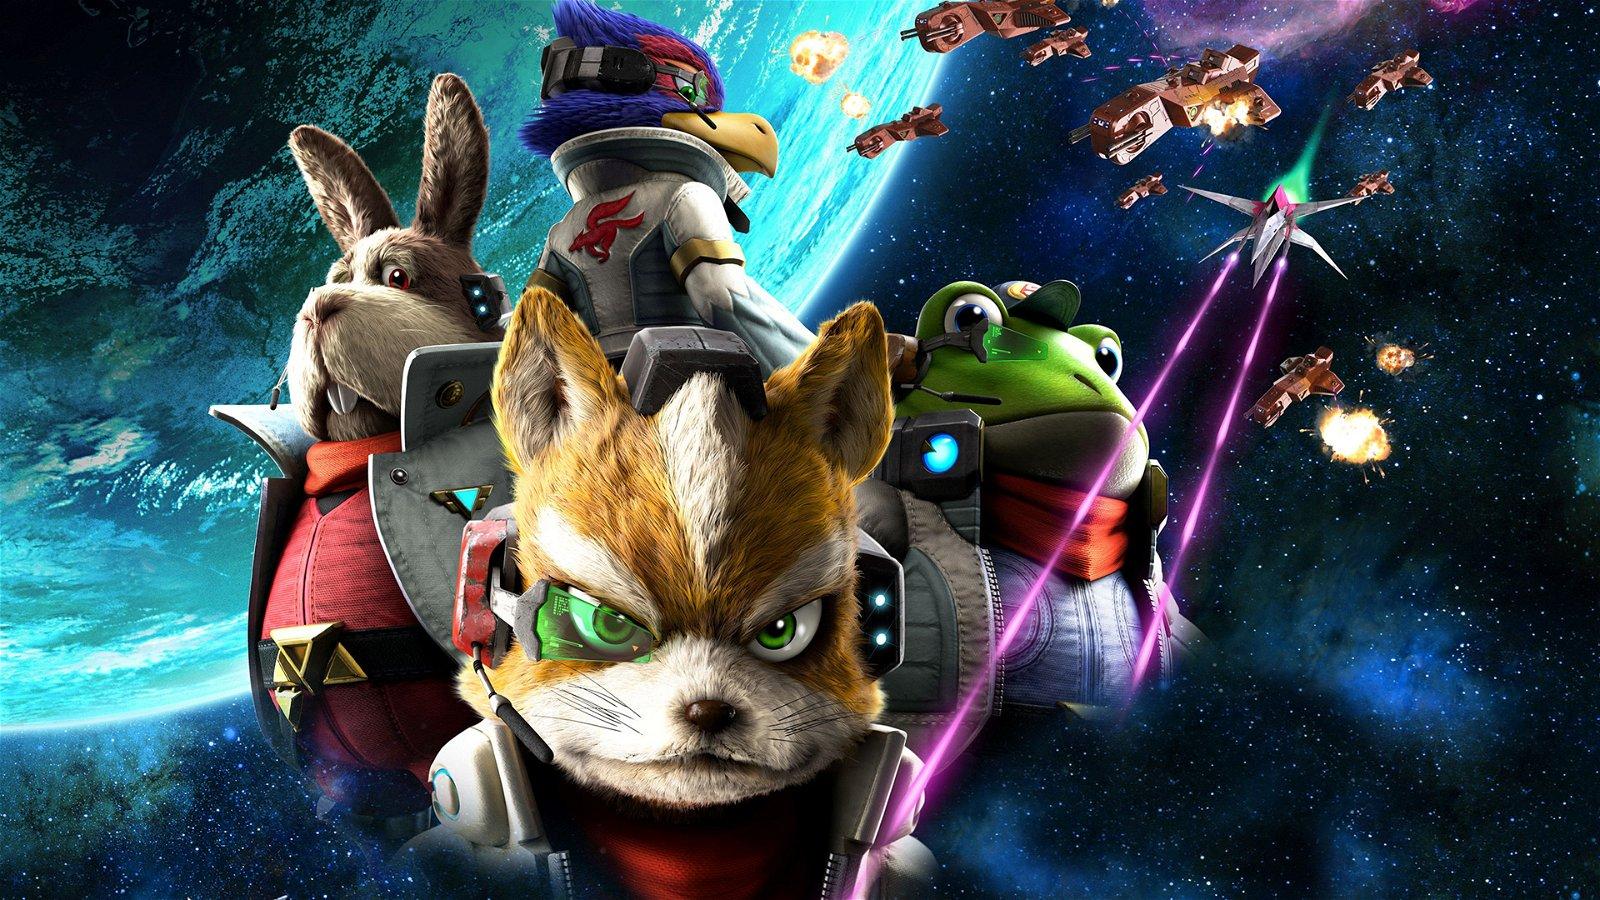 Star Fox Zero Animated Short Premiering on April 20th